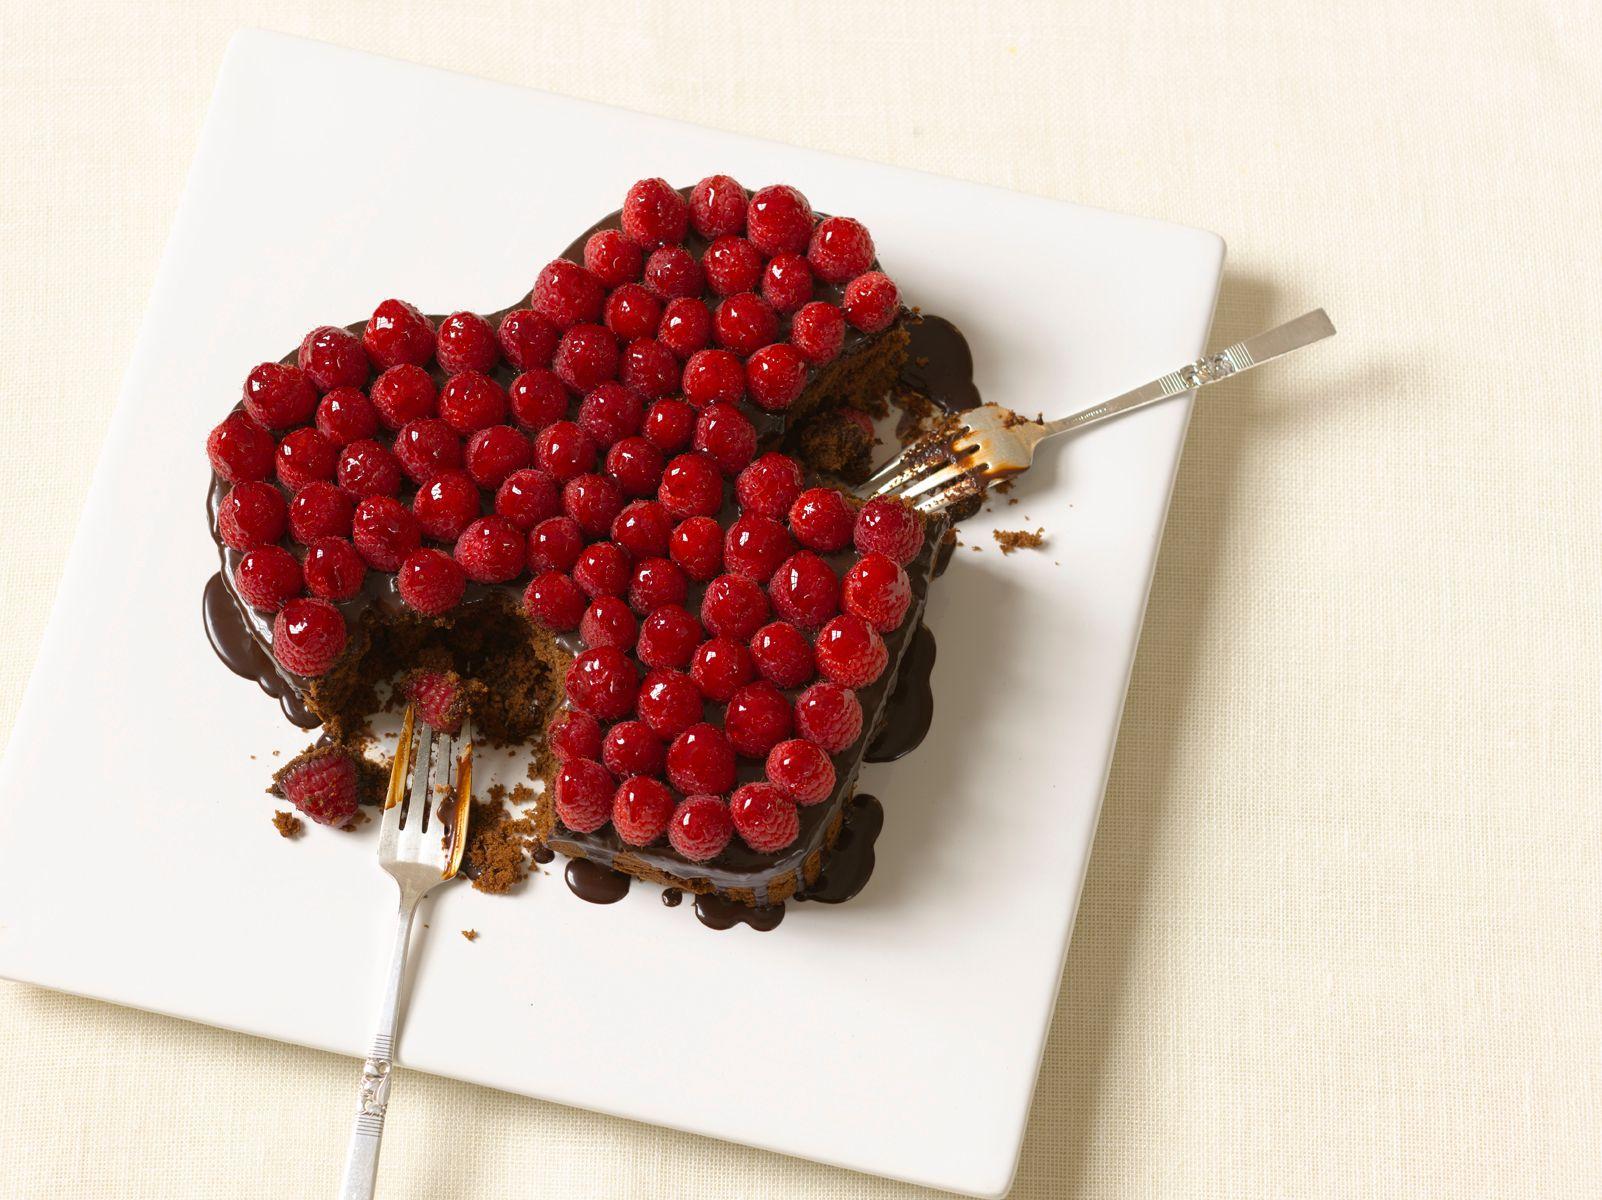 choc-raspberry-2.jpg